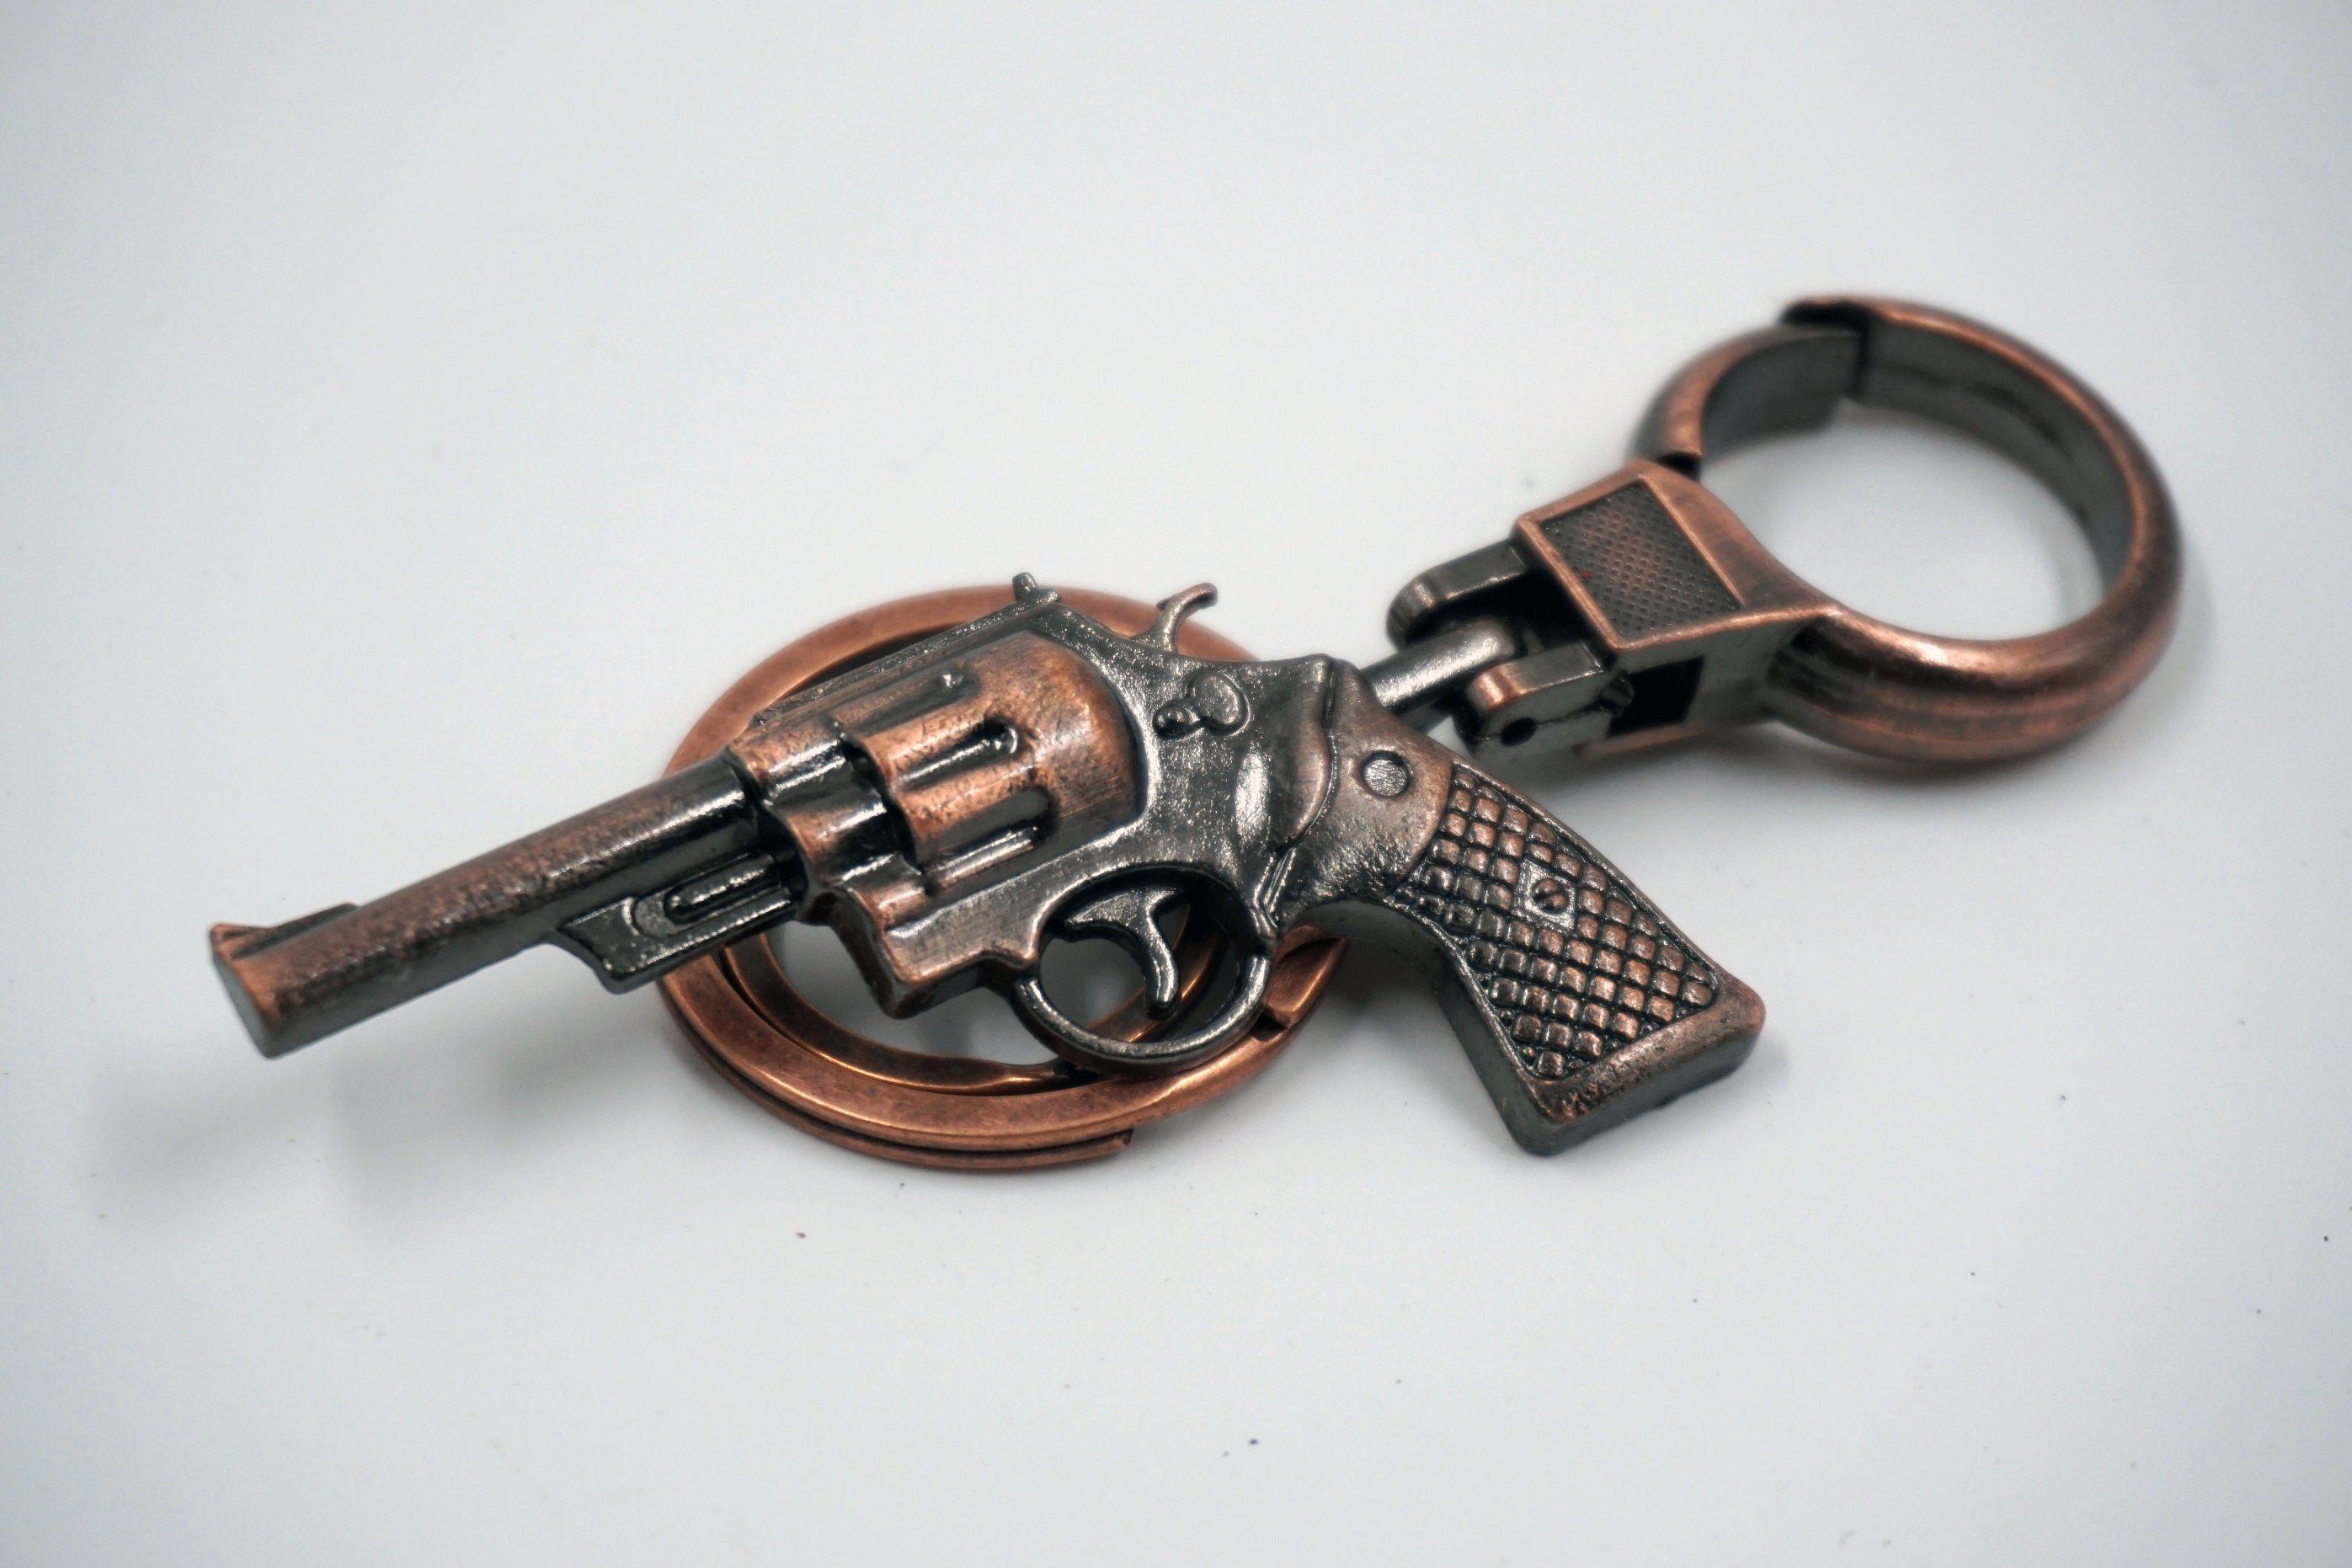 OEM Key Chain Metal Key Rings Acrylic Key Bag Holder Tassel Keychains Leather